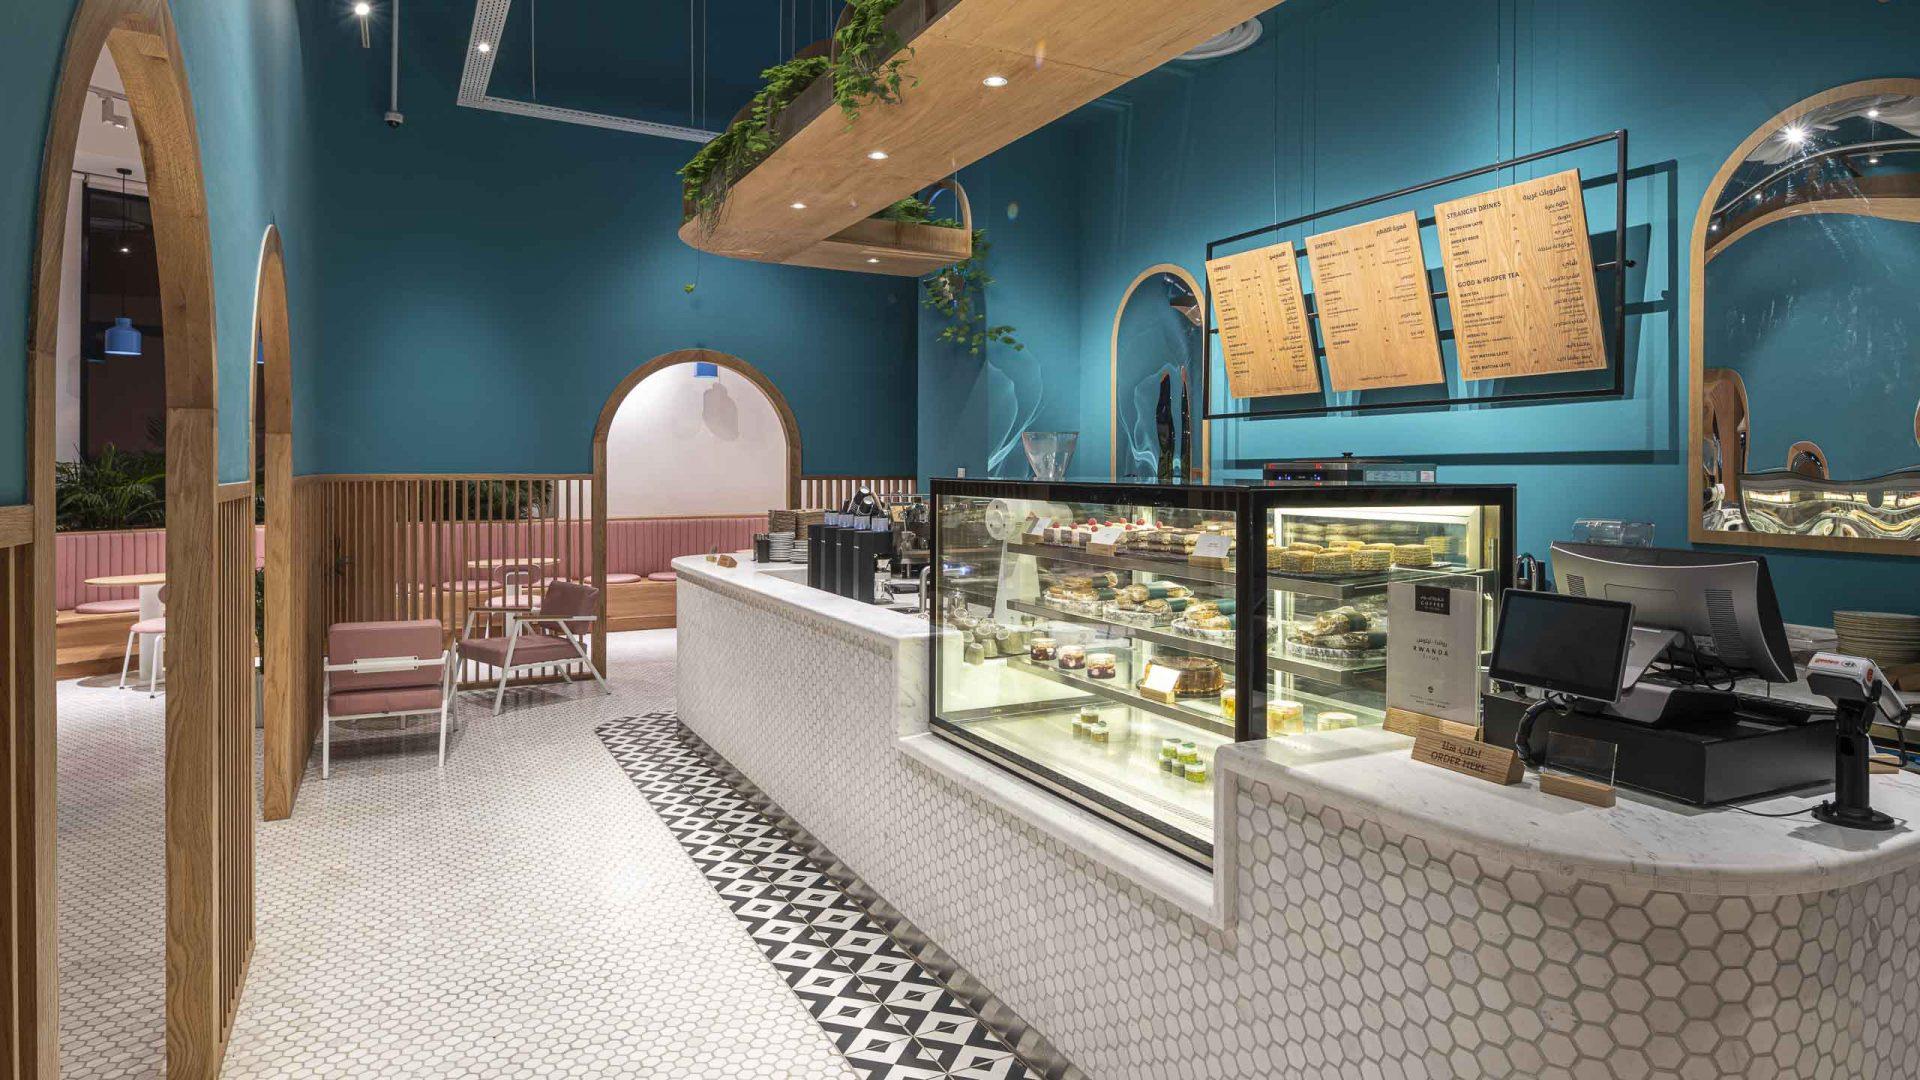 Brew92 Coffee Shop, Mecca by Liqui. Photograph of the ground floor level interior design